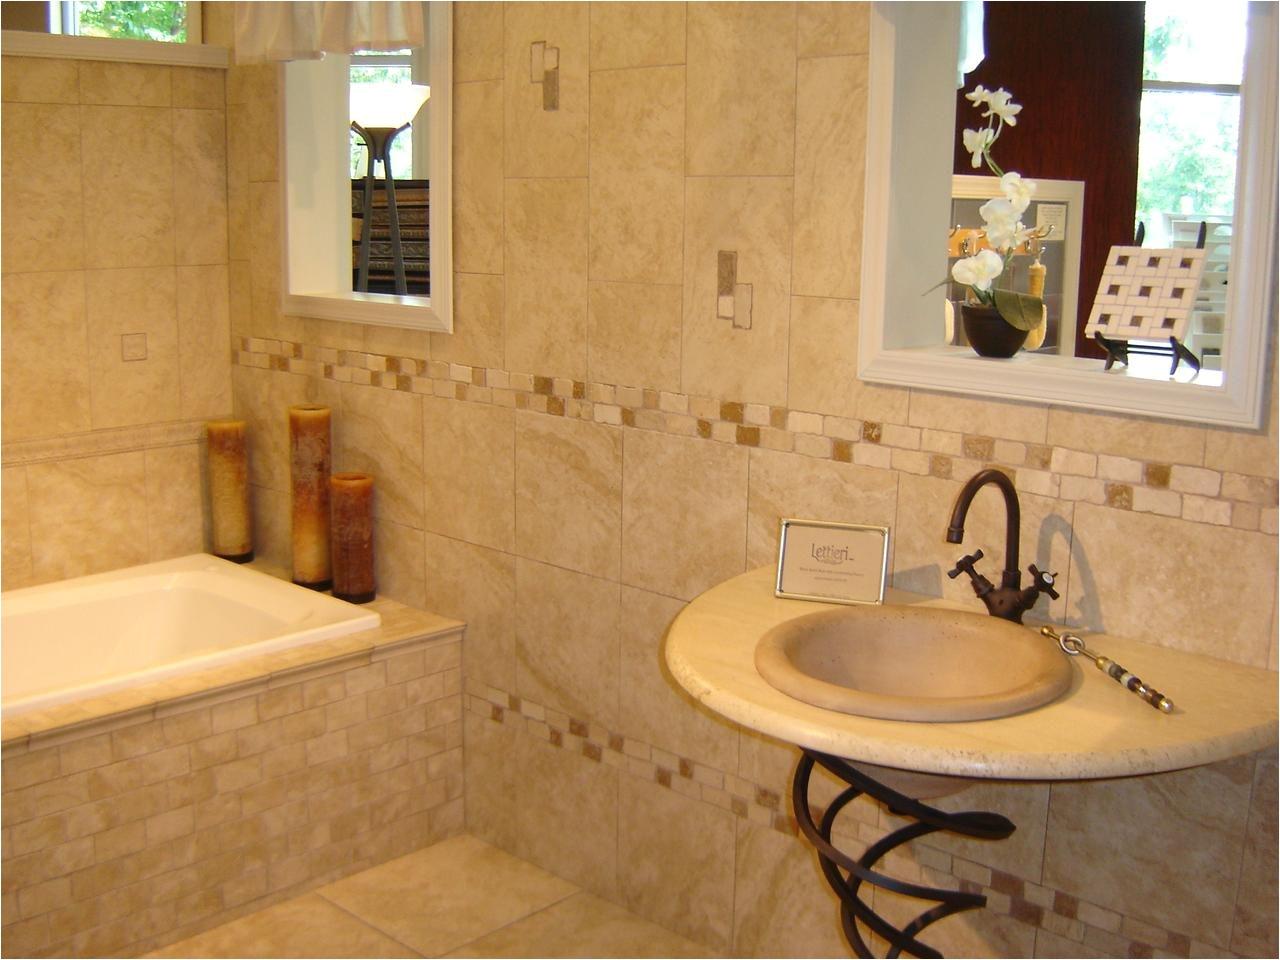 [Bathroom] Astonishing Small Bathroom Tiling Ideas For Bathroom Decoration Amazing Bathroom Design And Small Bathroom Tiling Ideas With Cream Tile Bathroom